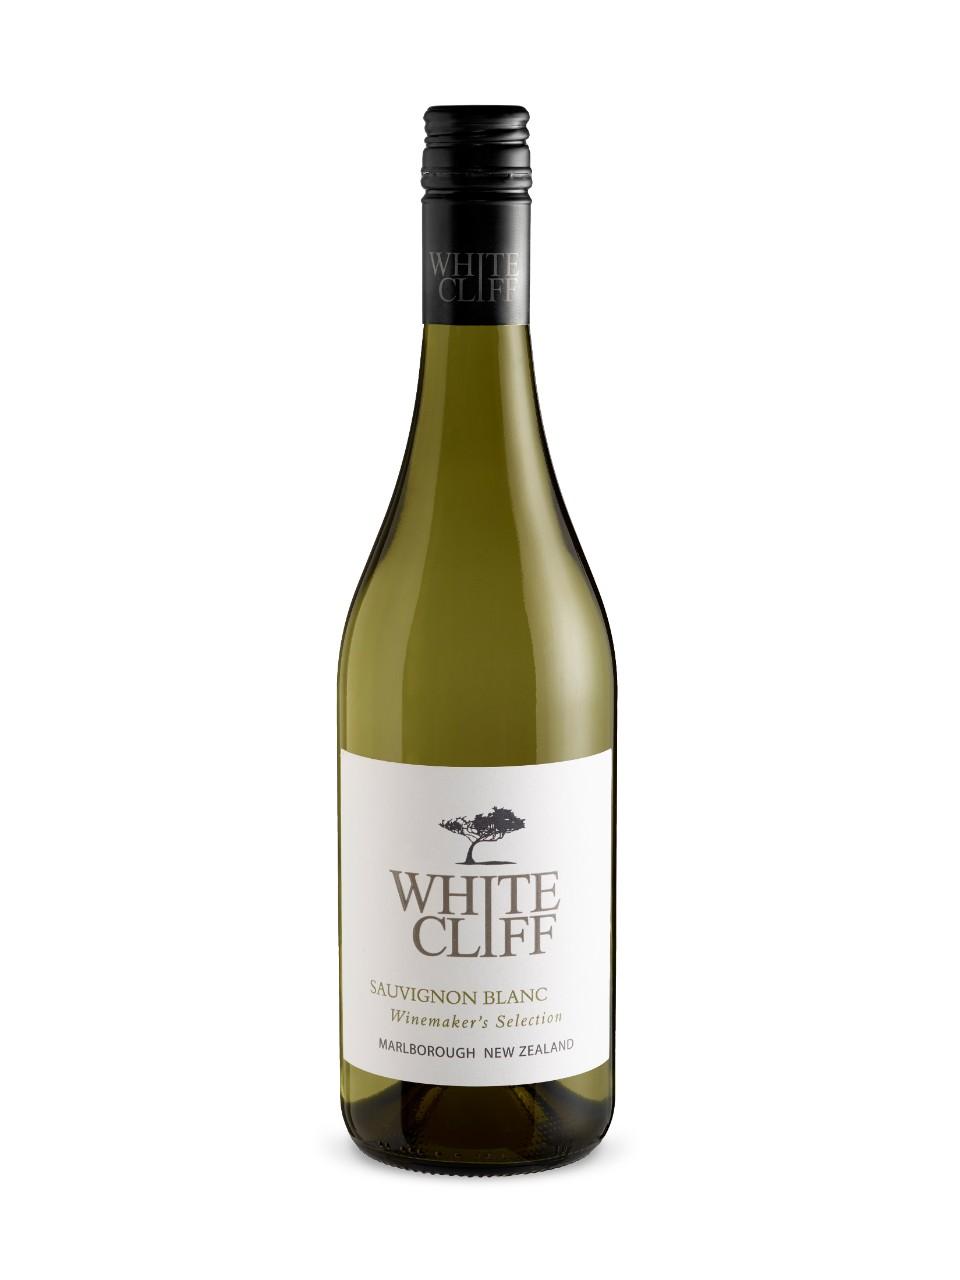 White Cliff Sauvignon Blanc